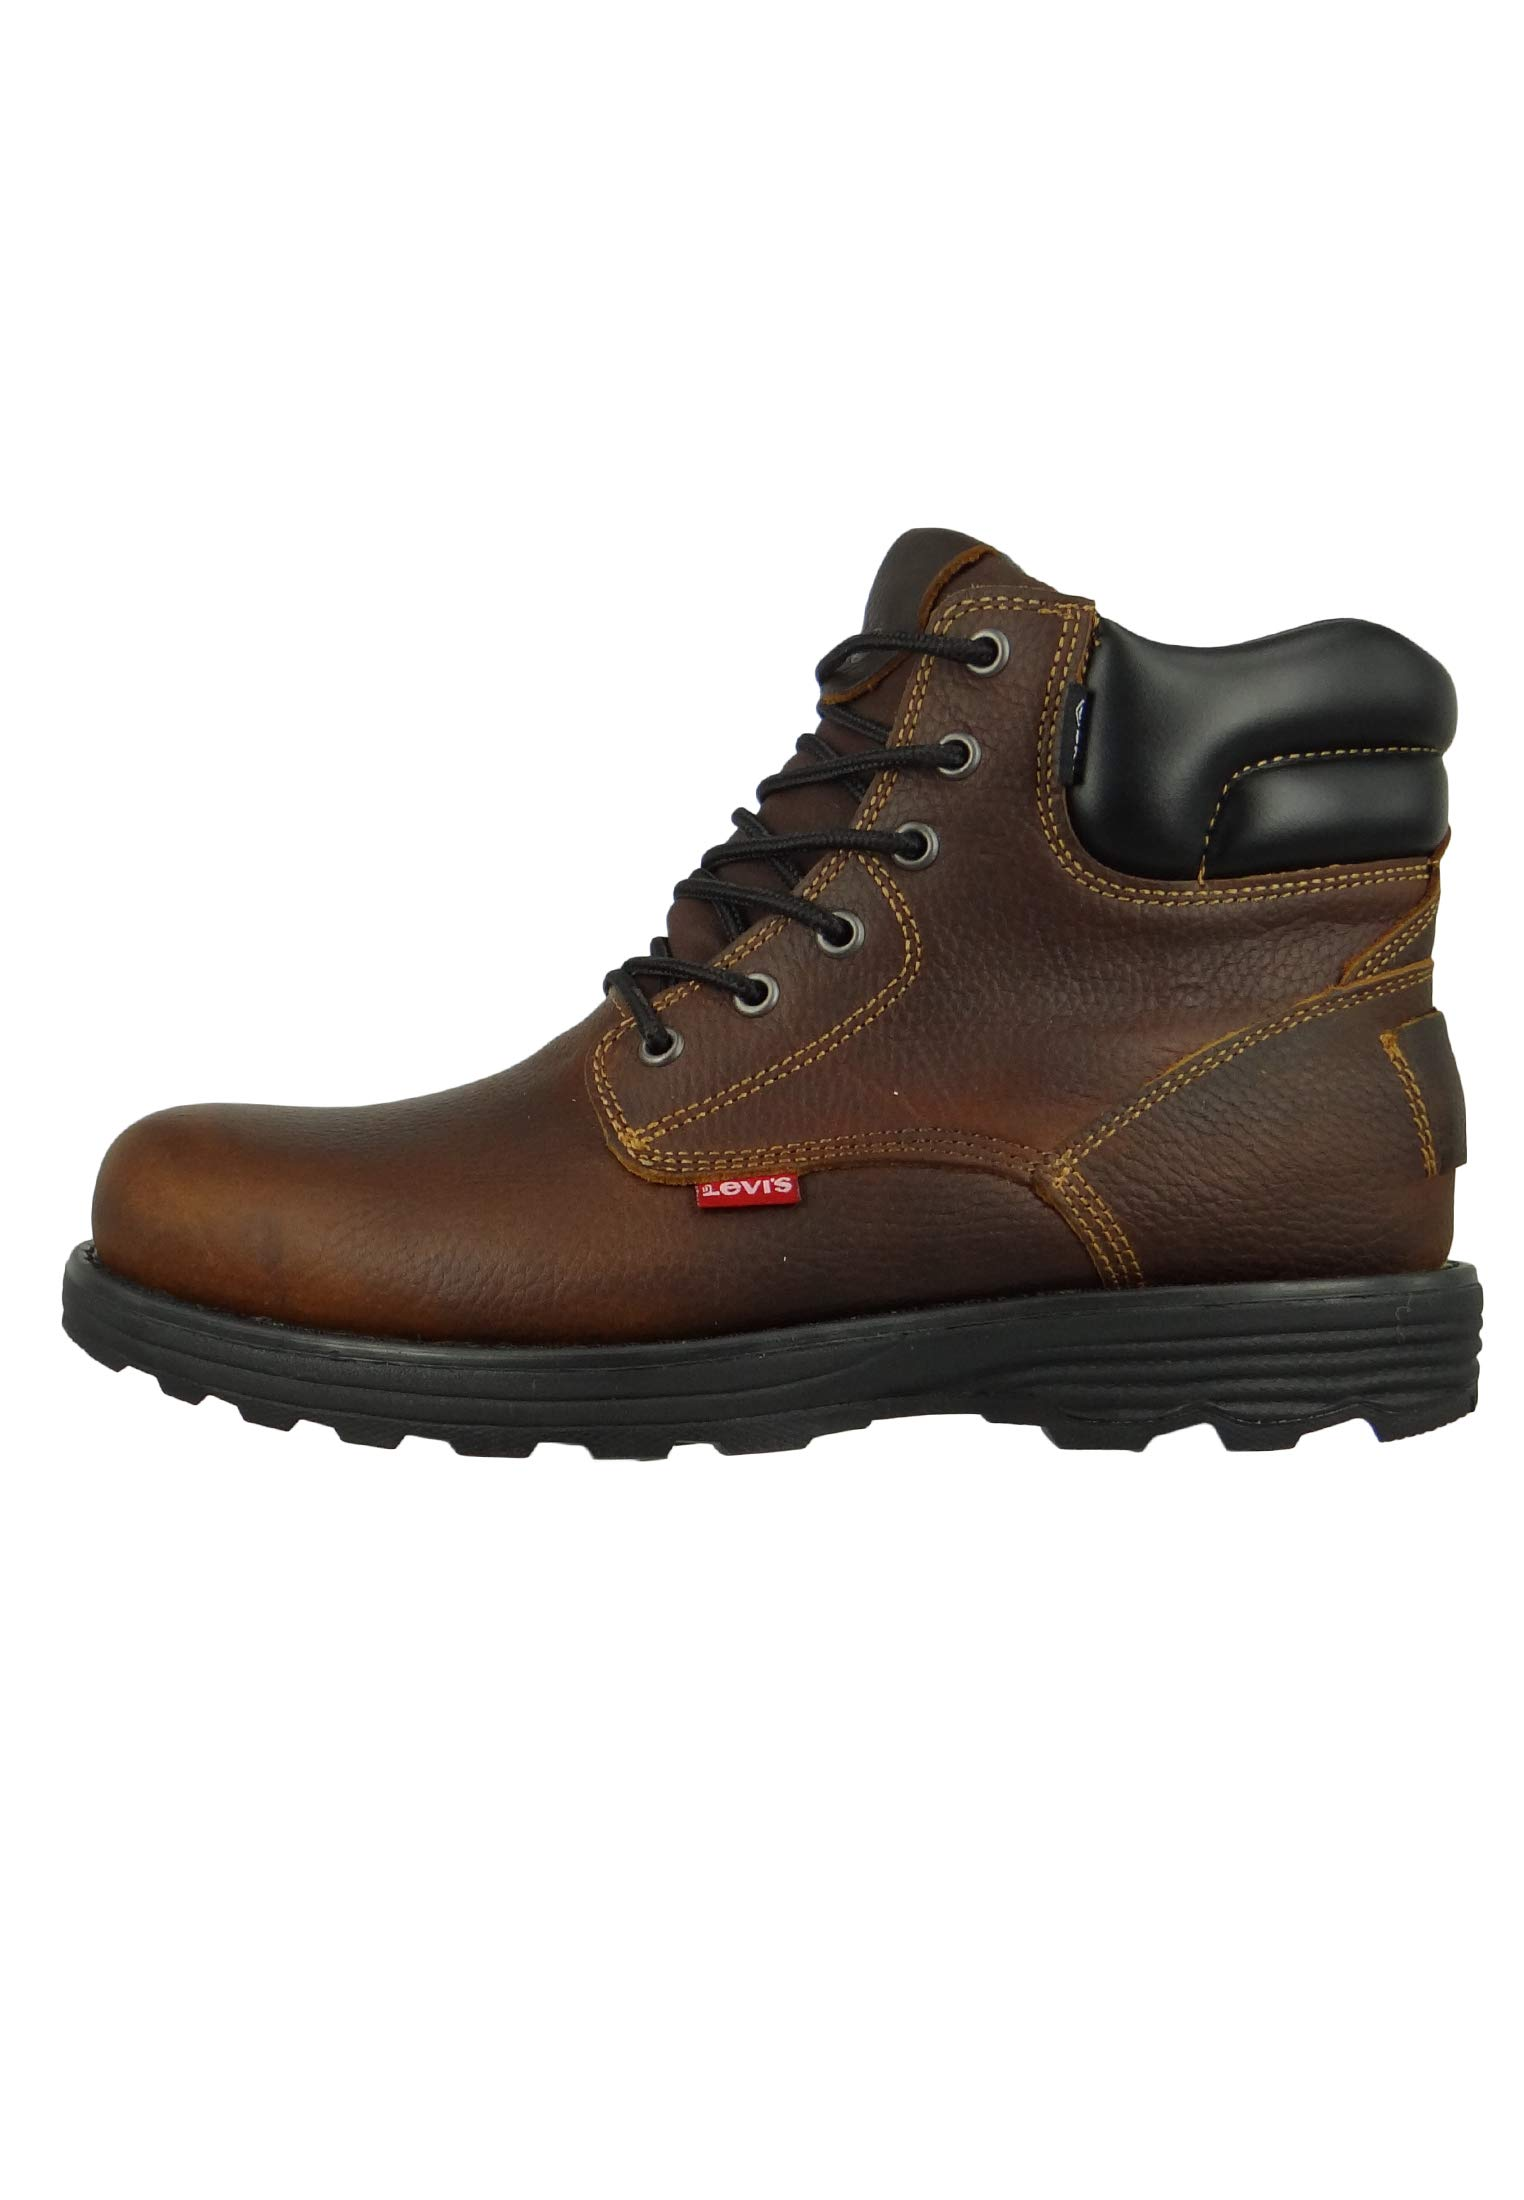 Levi's Arrowhead 228777-829-128 Men's Walking Boots Brown 2